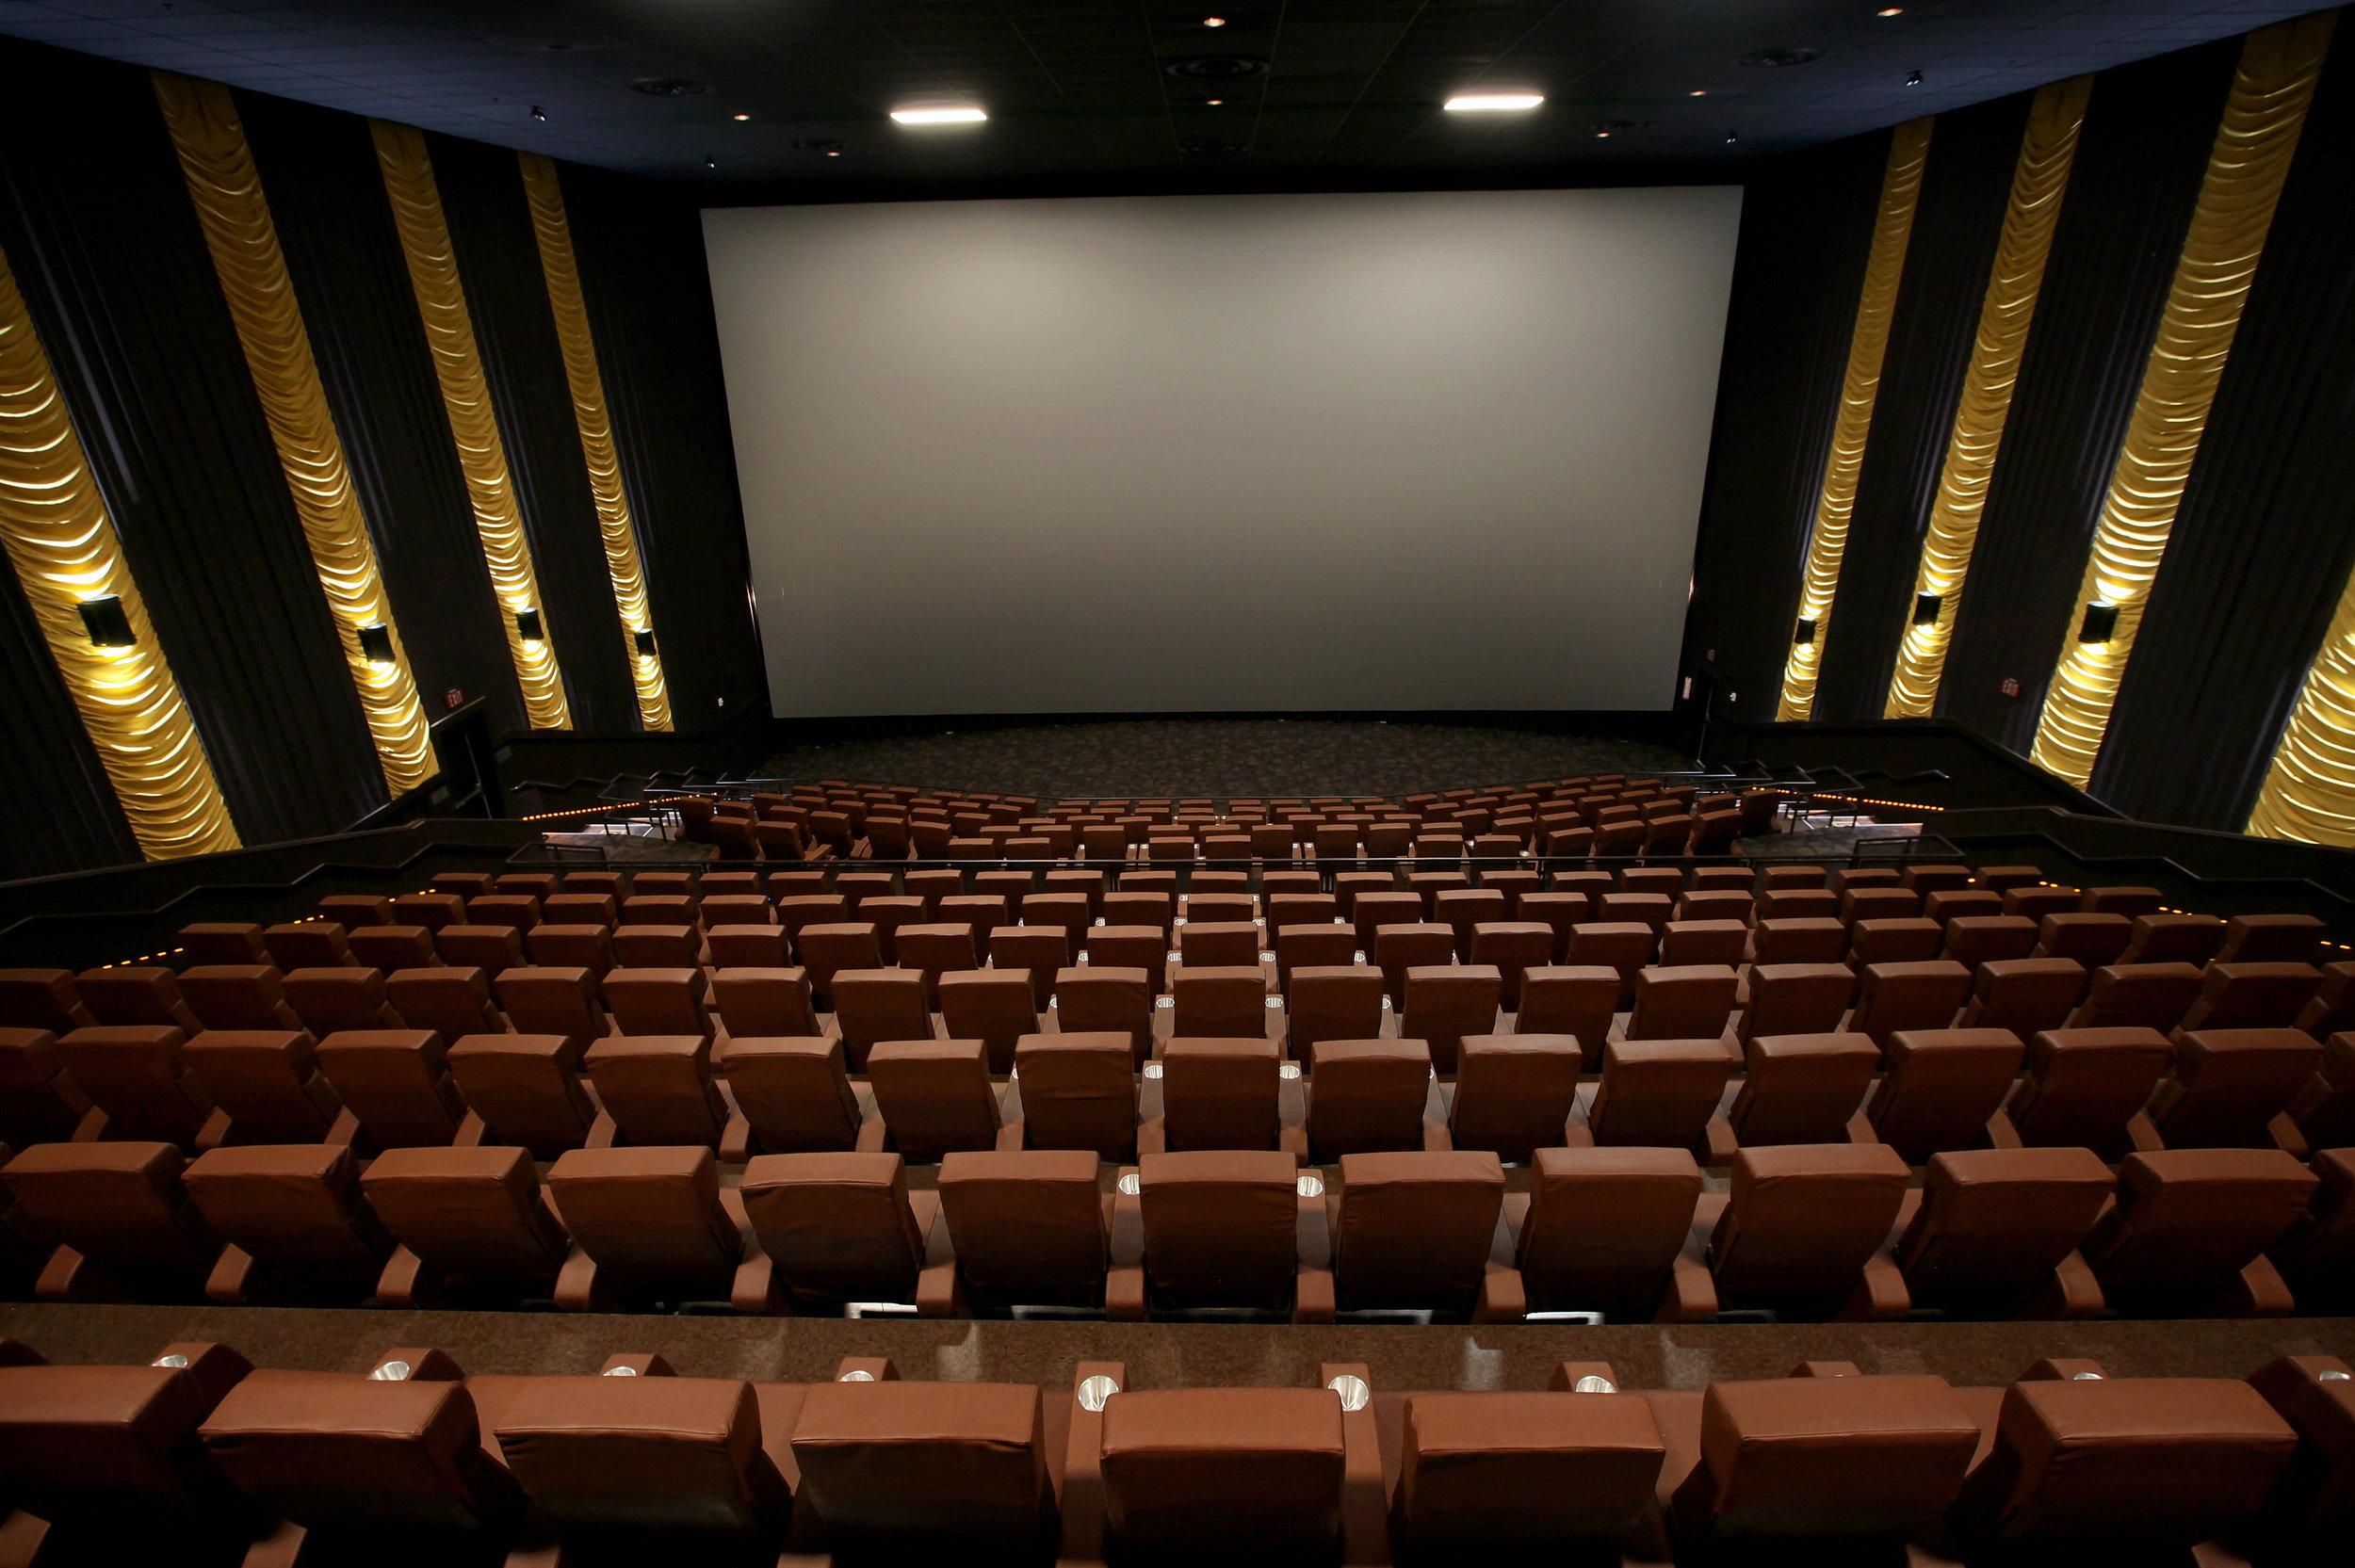 ADW-Entertainment-CineBowl-Grille-Blacksburg-VA-11.jpg